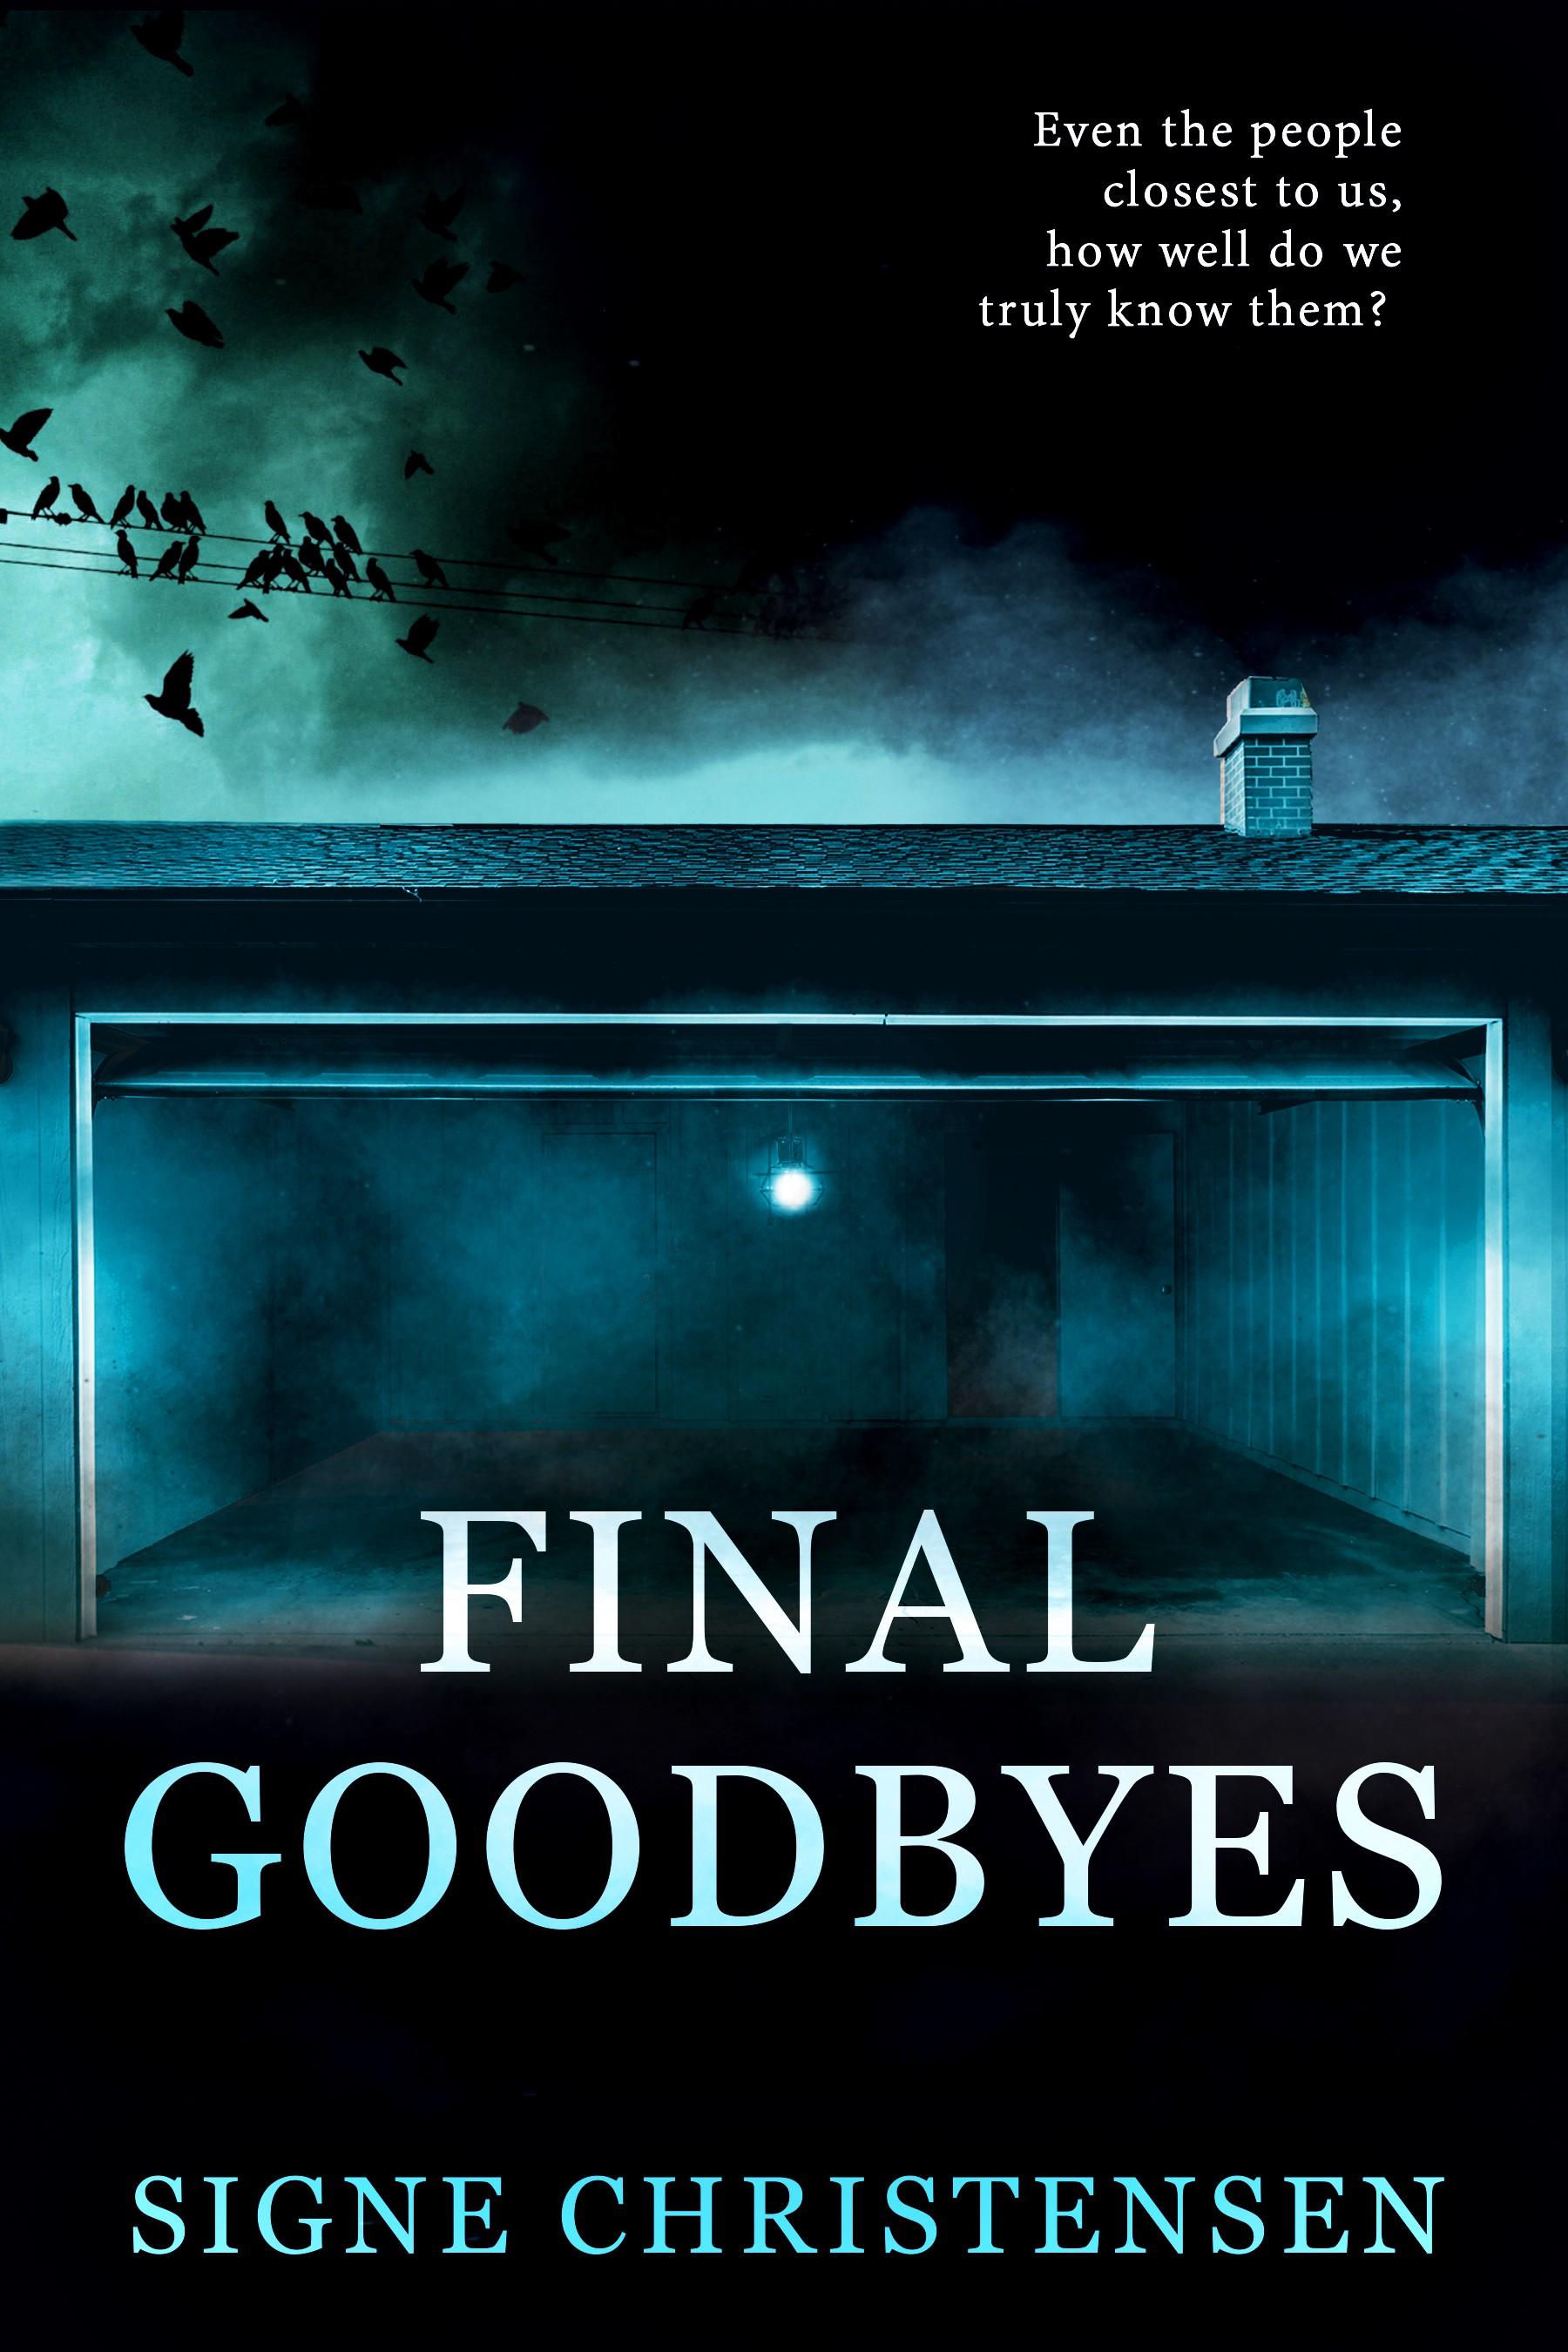 Ebook cover for psycological thriller